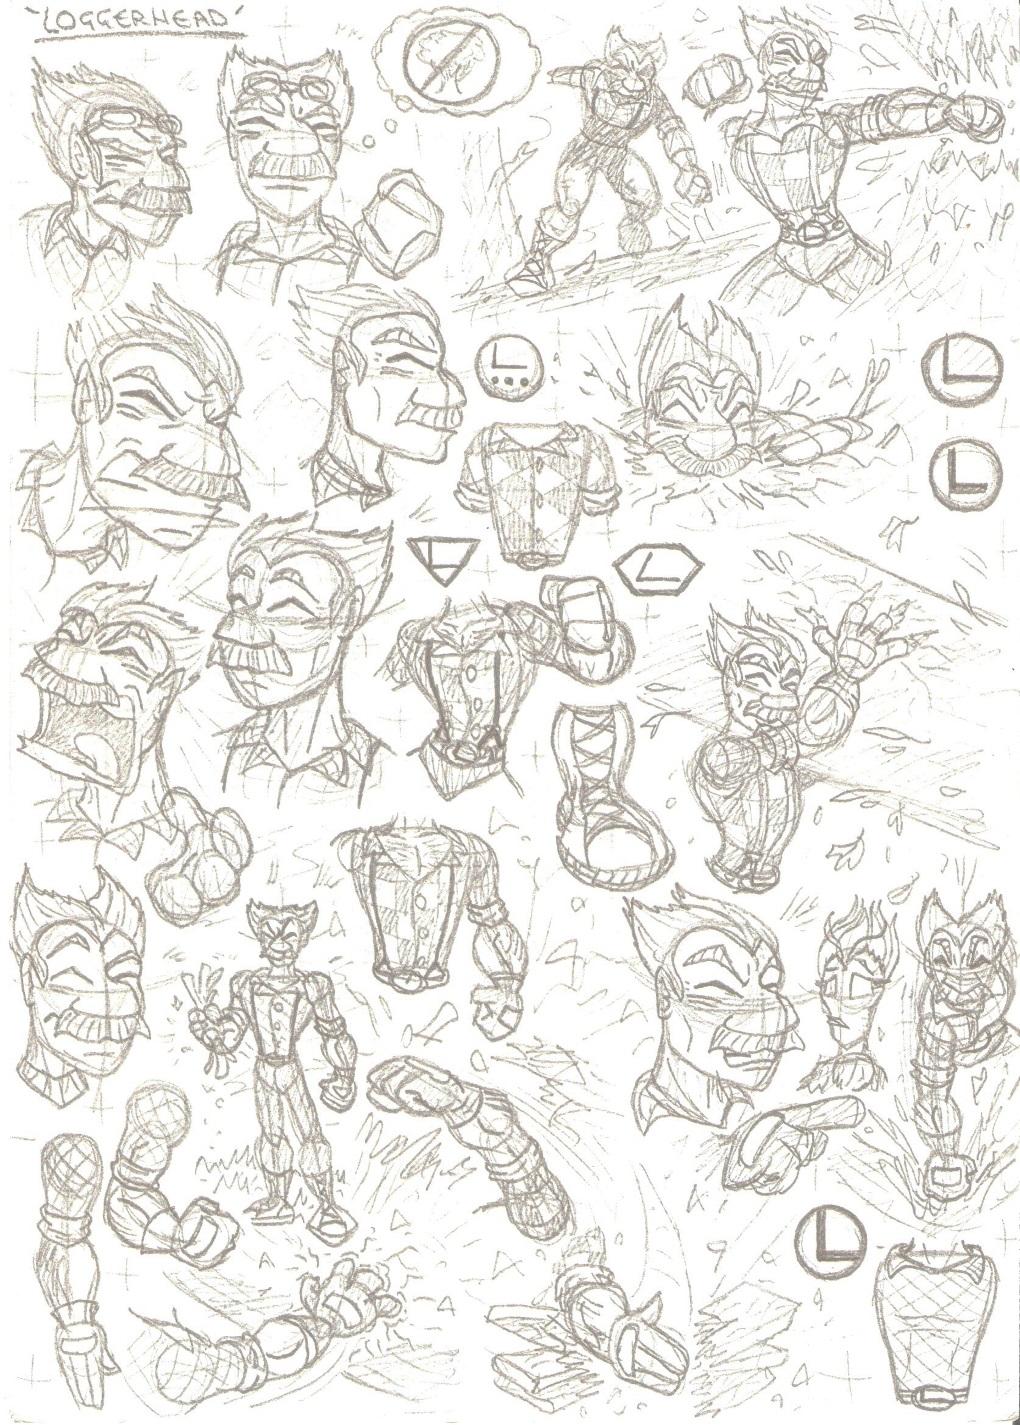 Concept art: Loggerhead 1